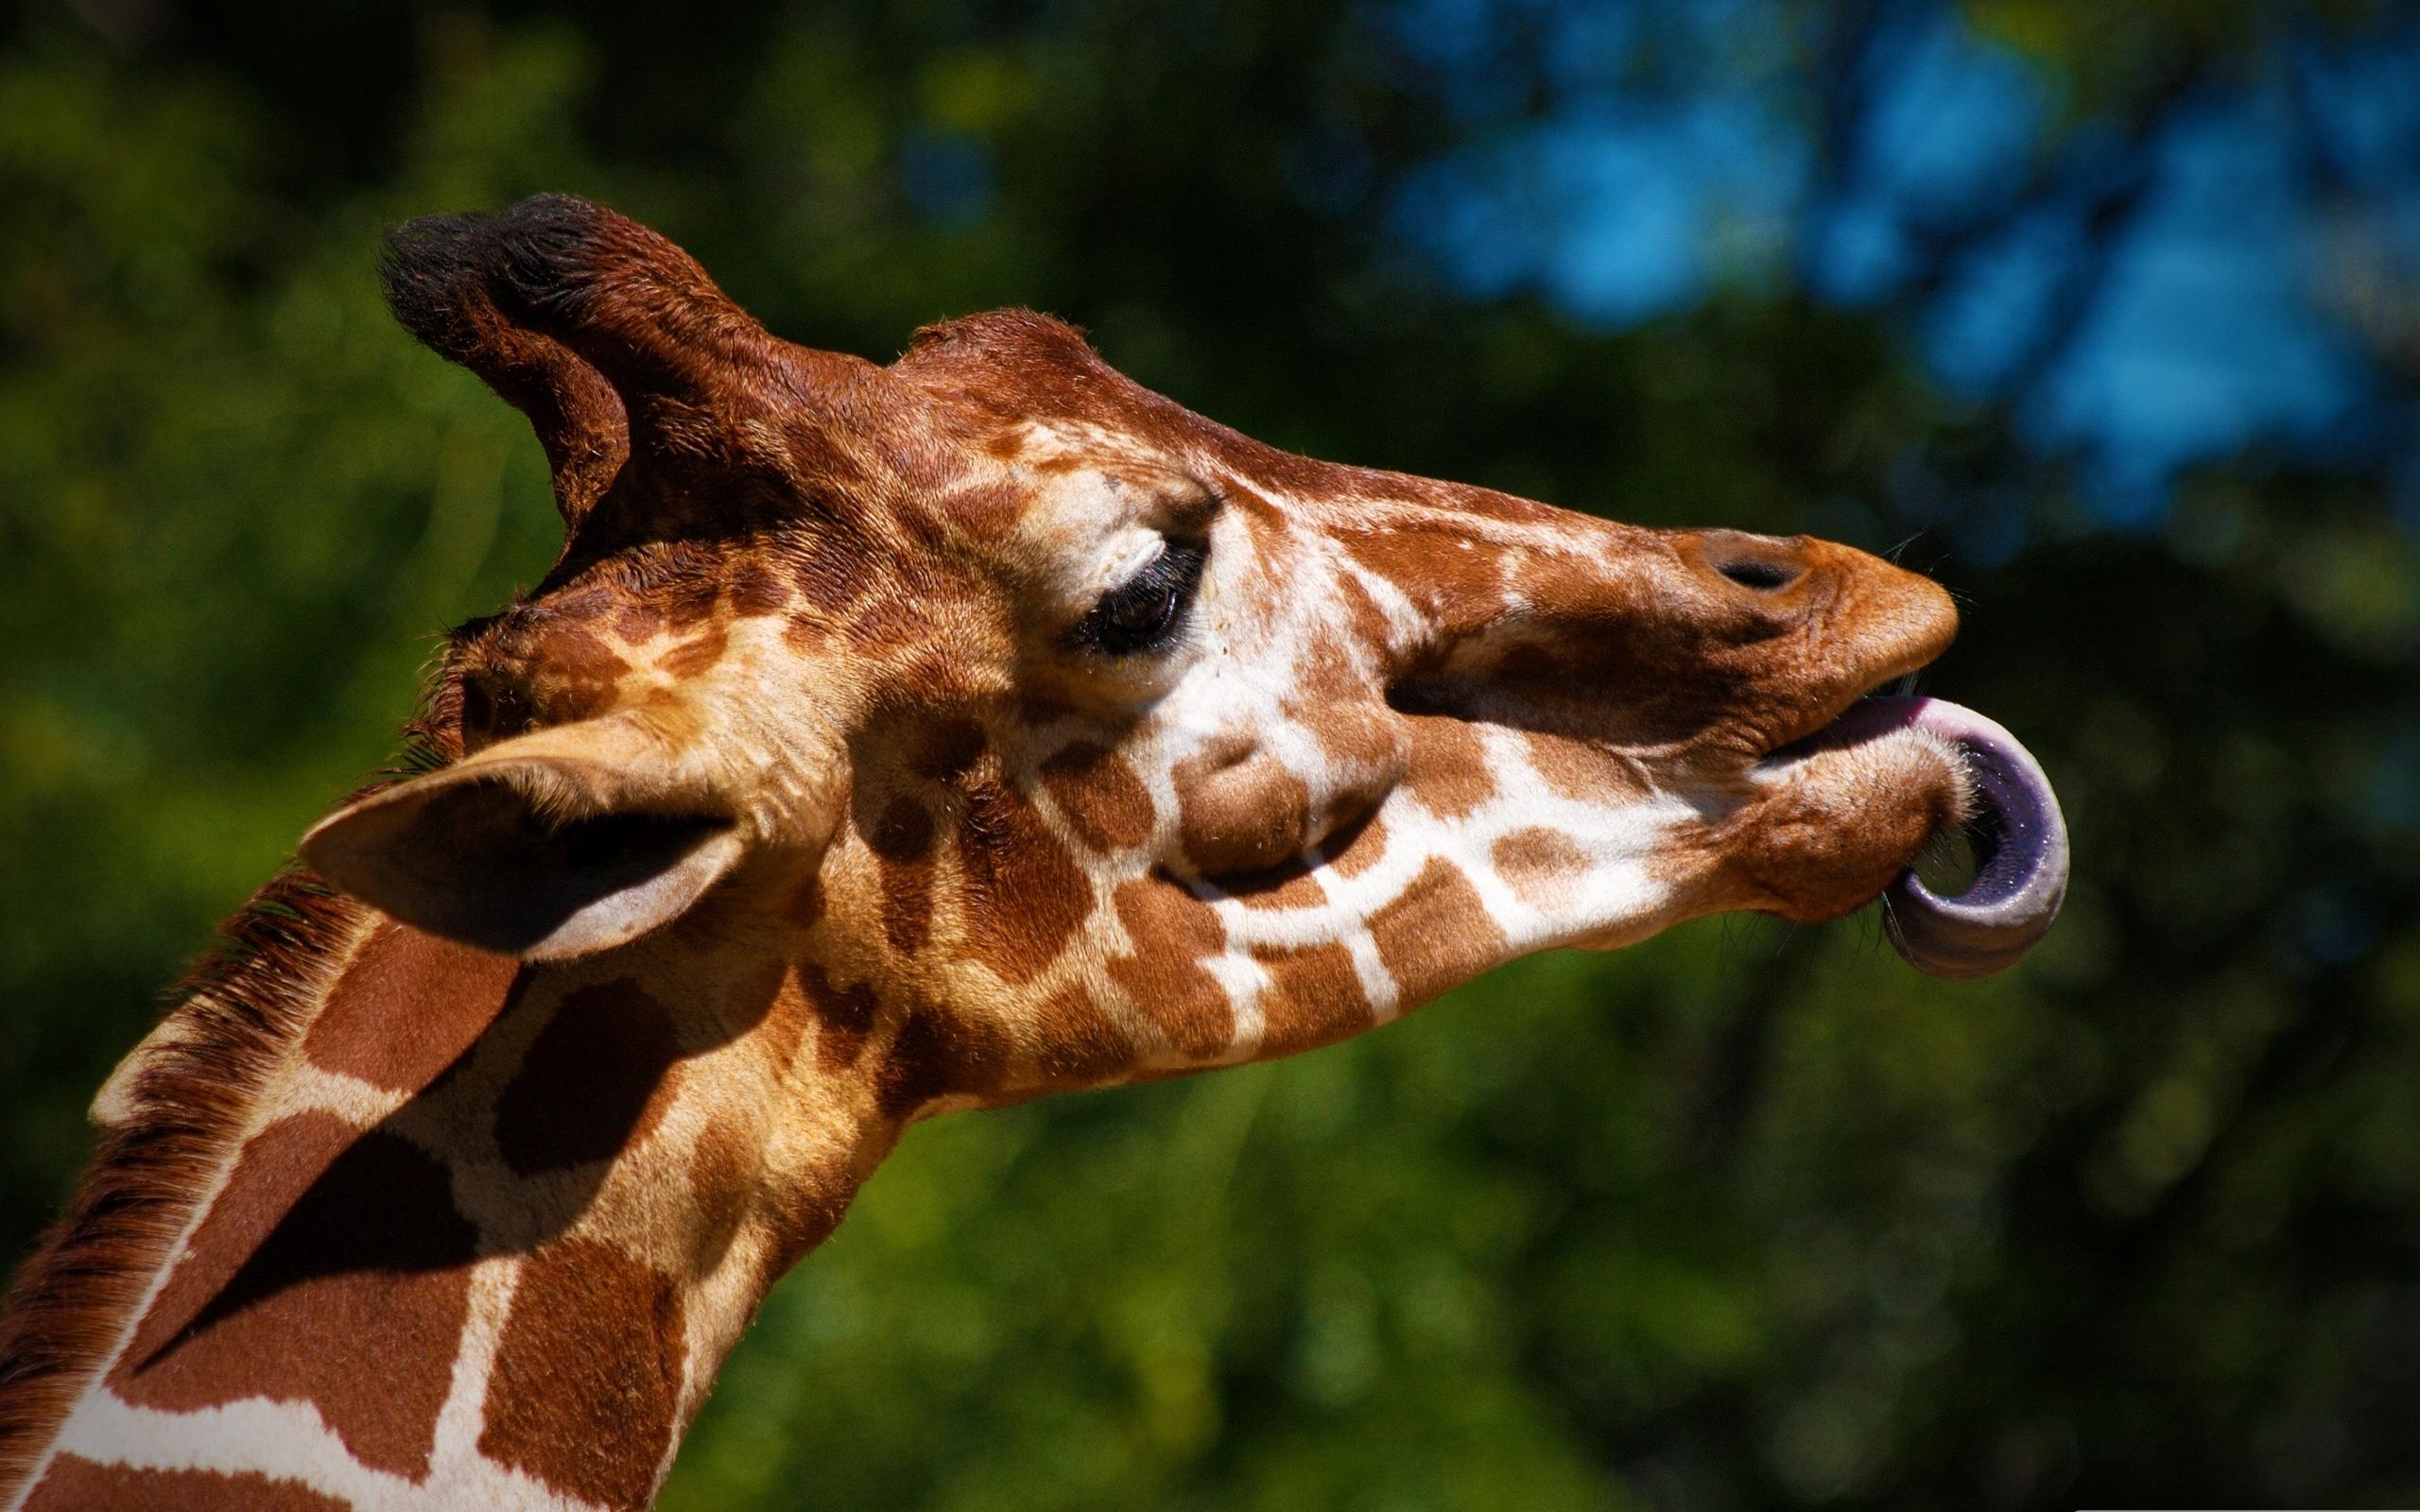 Giraffe Full HD Wallpaper and Background Image | 2560x1600 ...